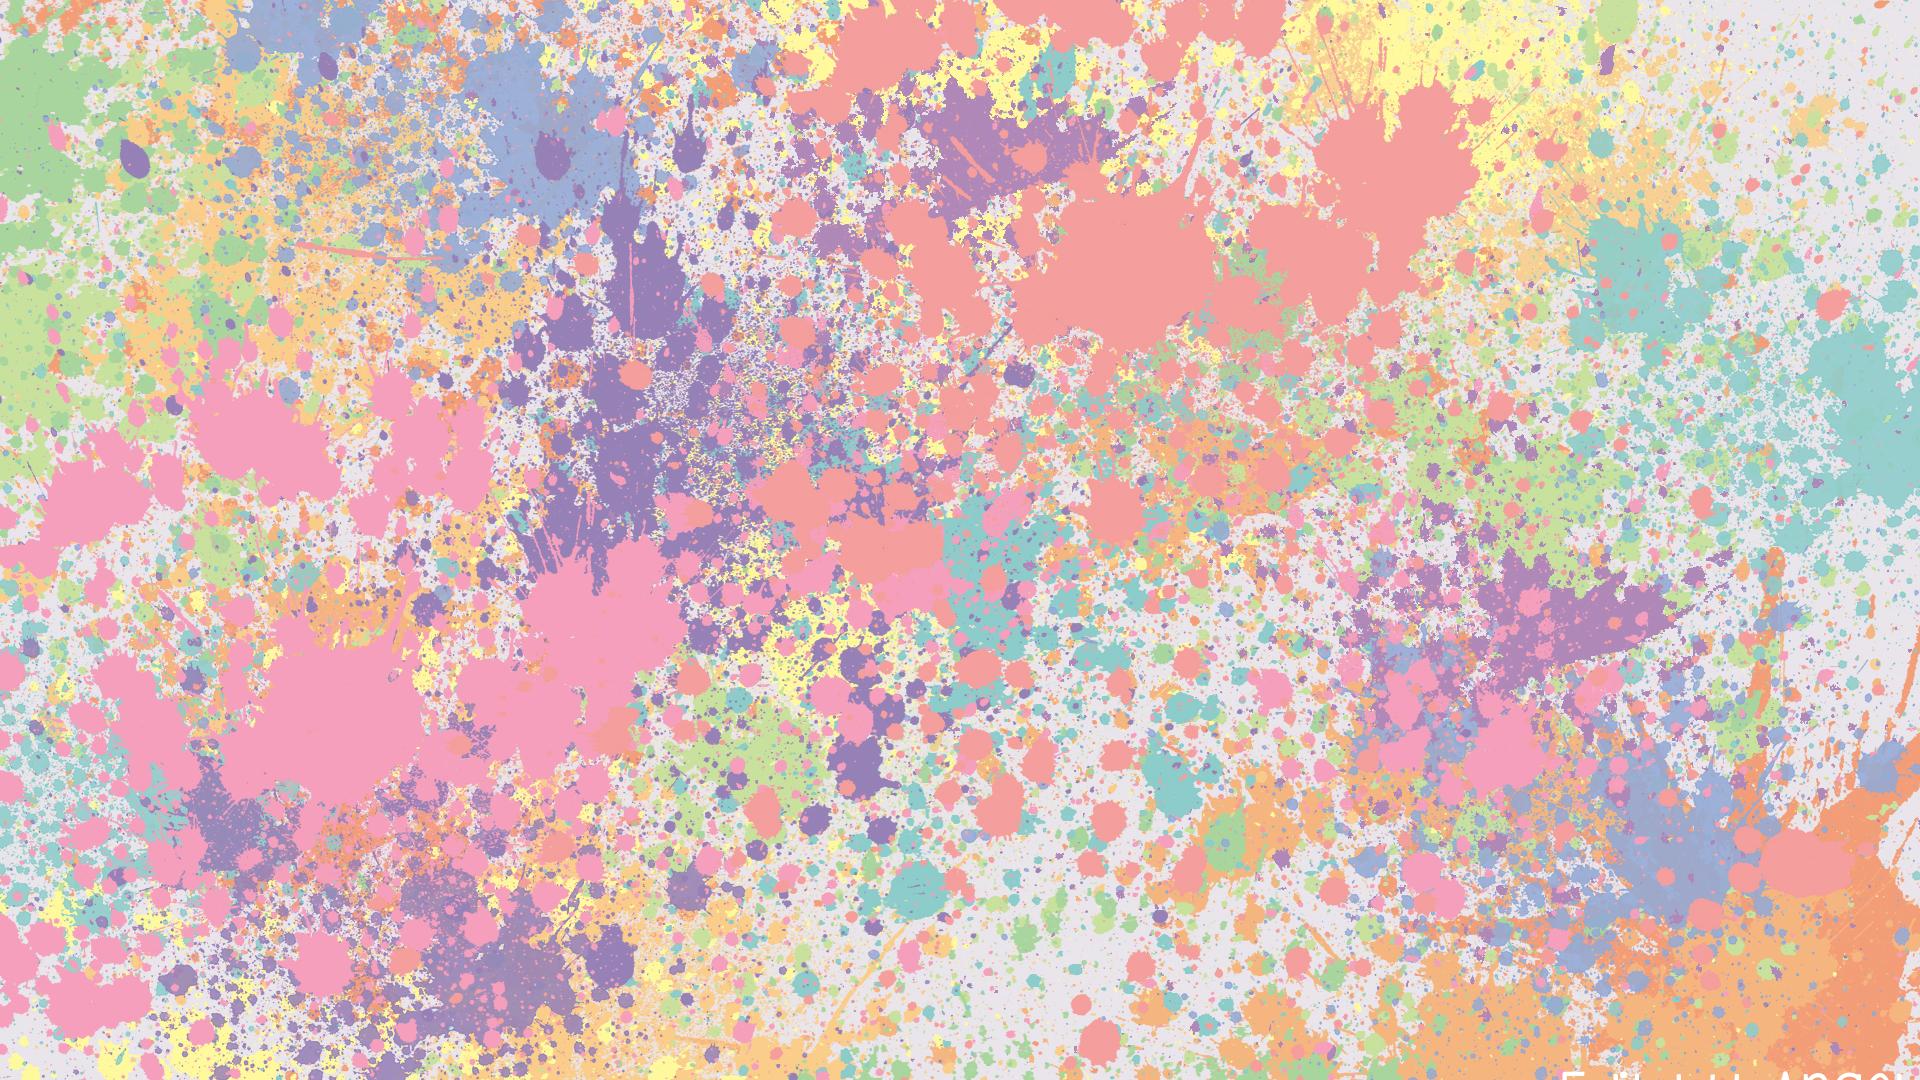 Free Download Pastel Splat Wallpaper By Foolish Angel 1920x1200 For Your Desktop Mobile Tablet Explore 75 Pastel Wallpapers Pastel Backgrounds Pastel Wallpaper Pastel Wallpapers